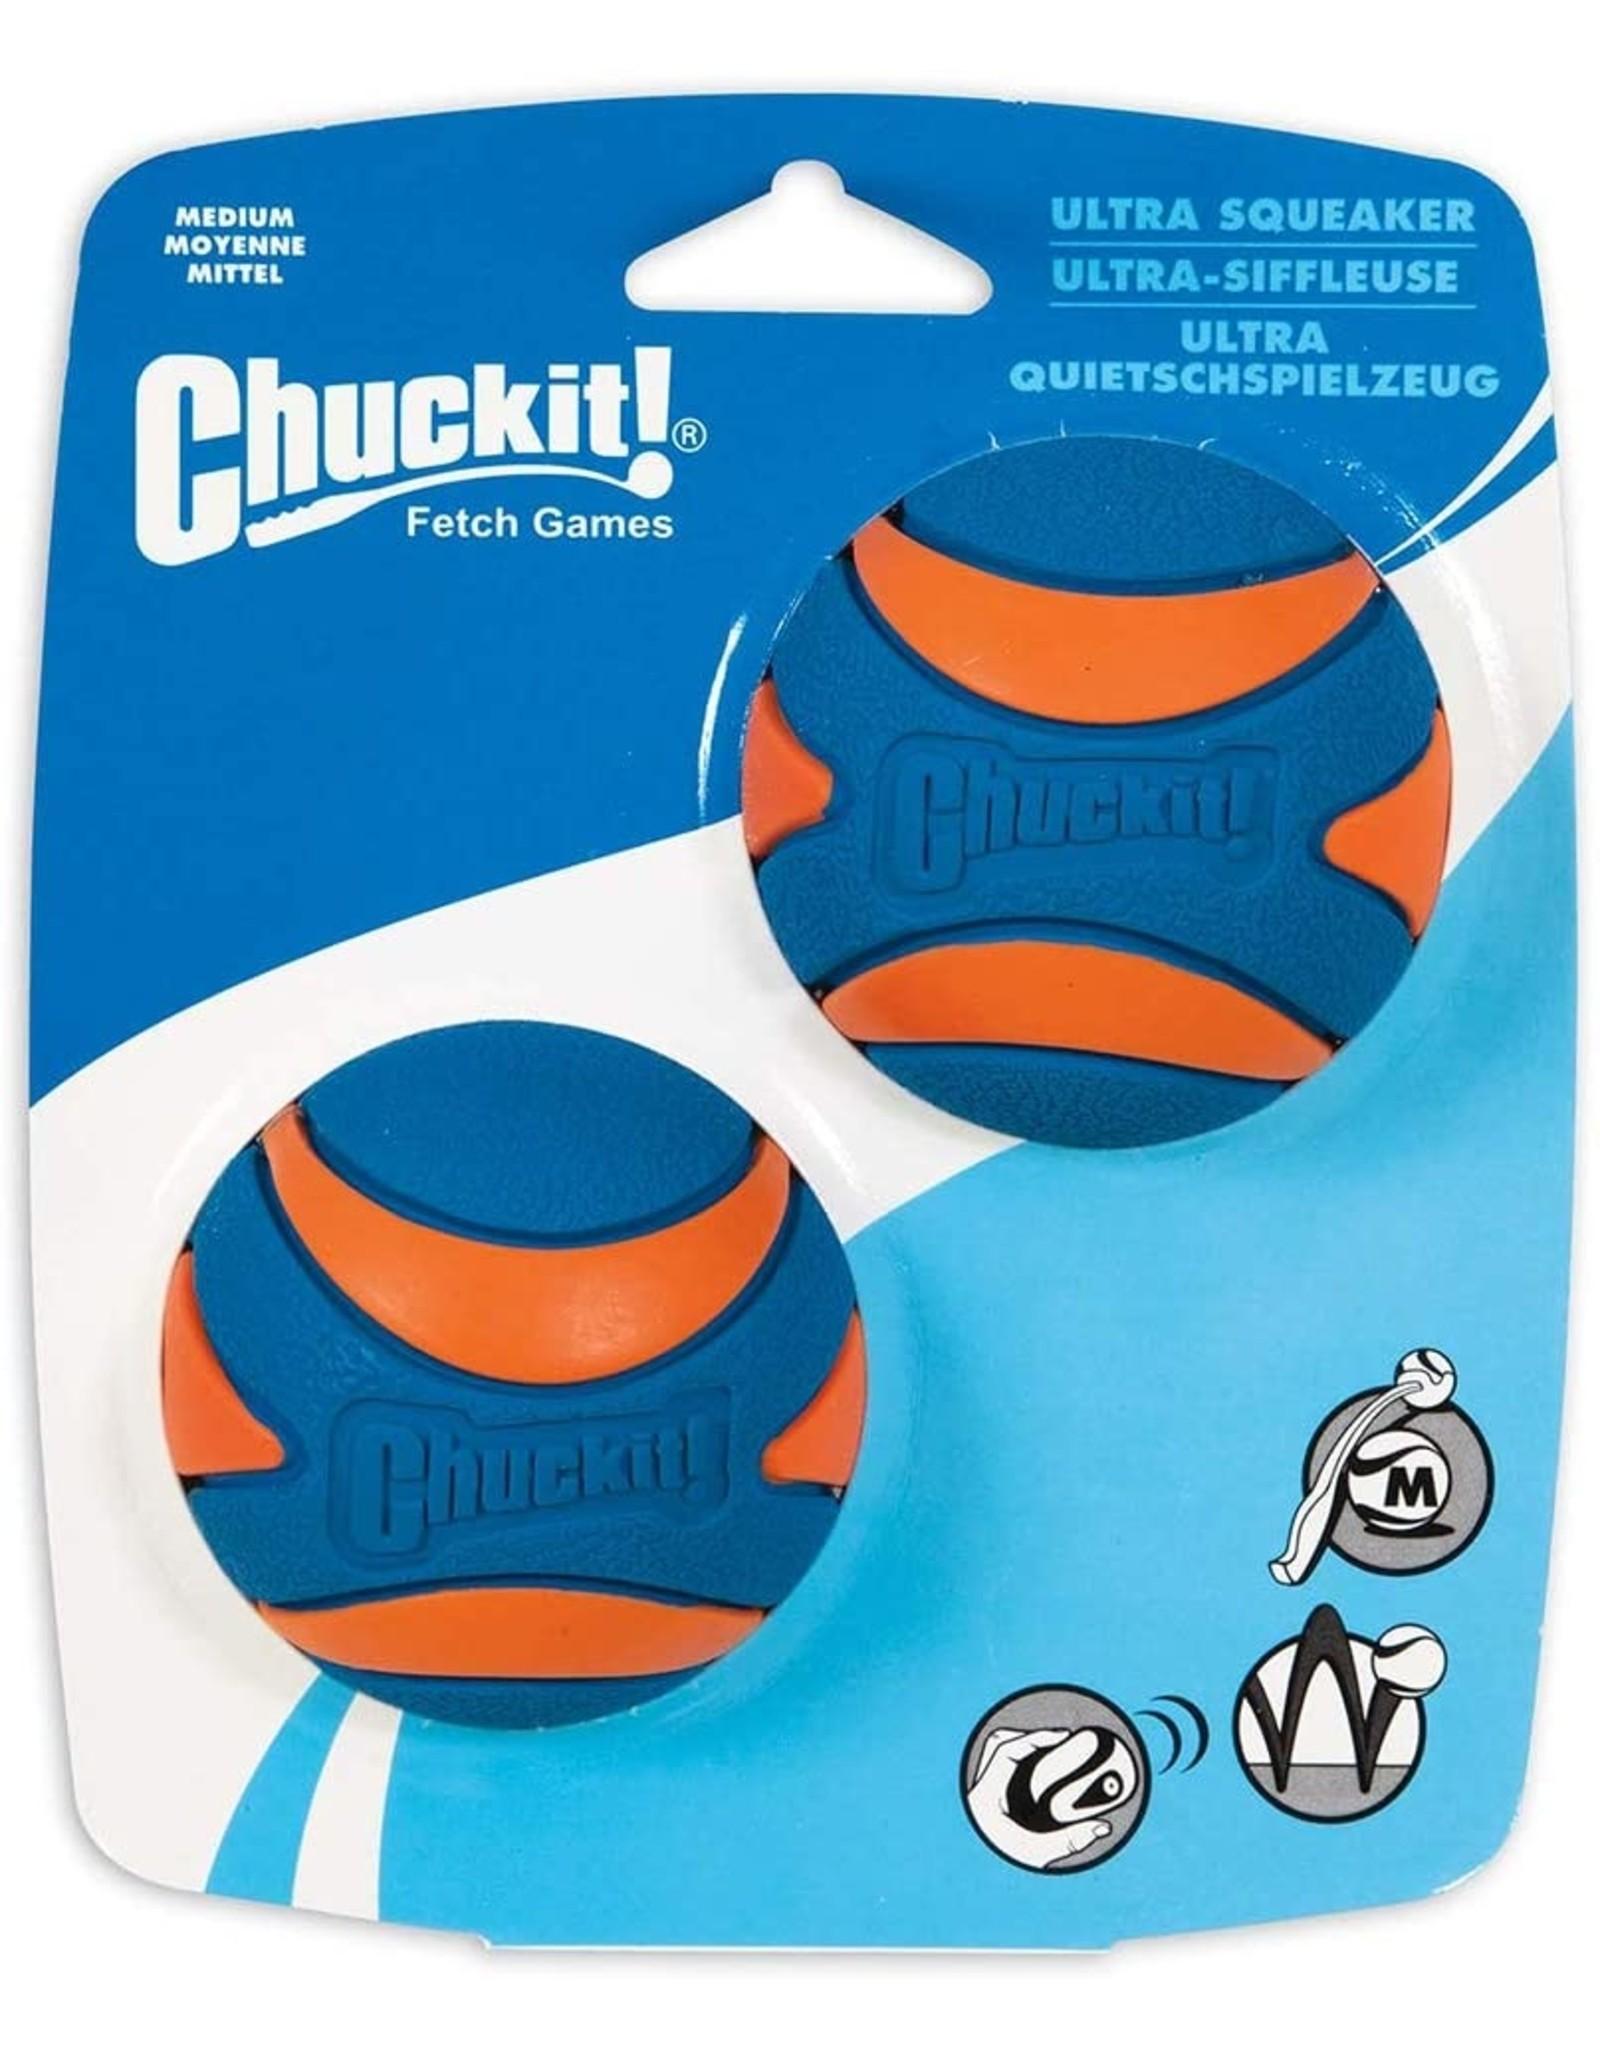 Chuckit! Ultra Squeaker Ball 2-Pack Medium